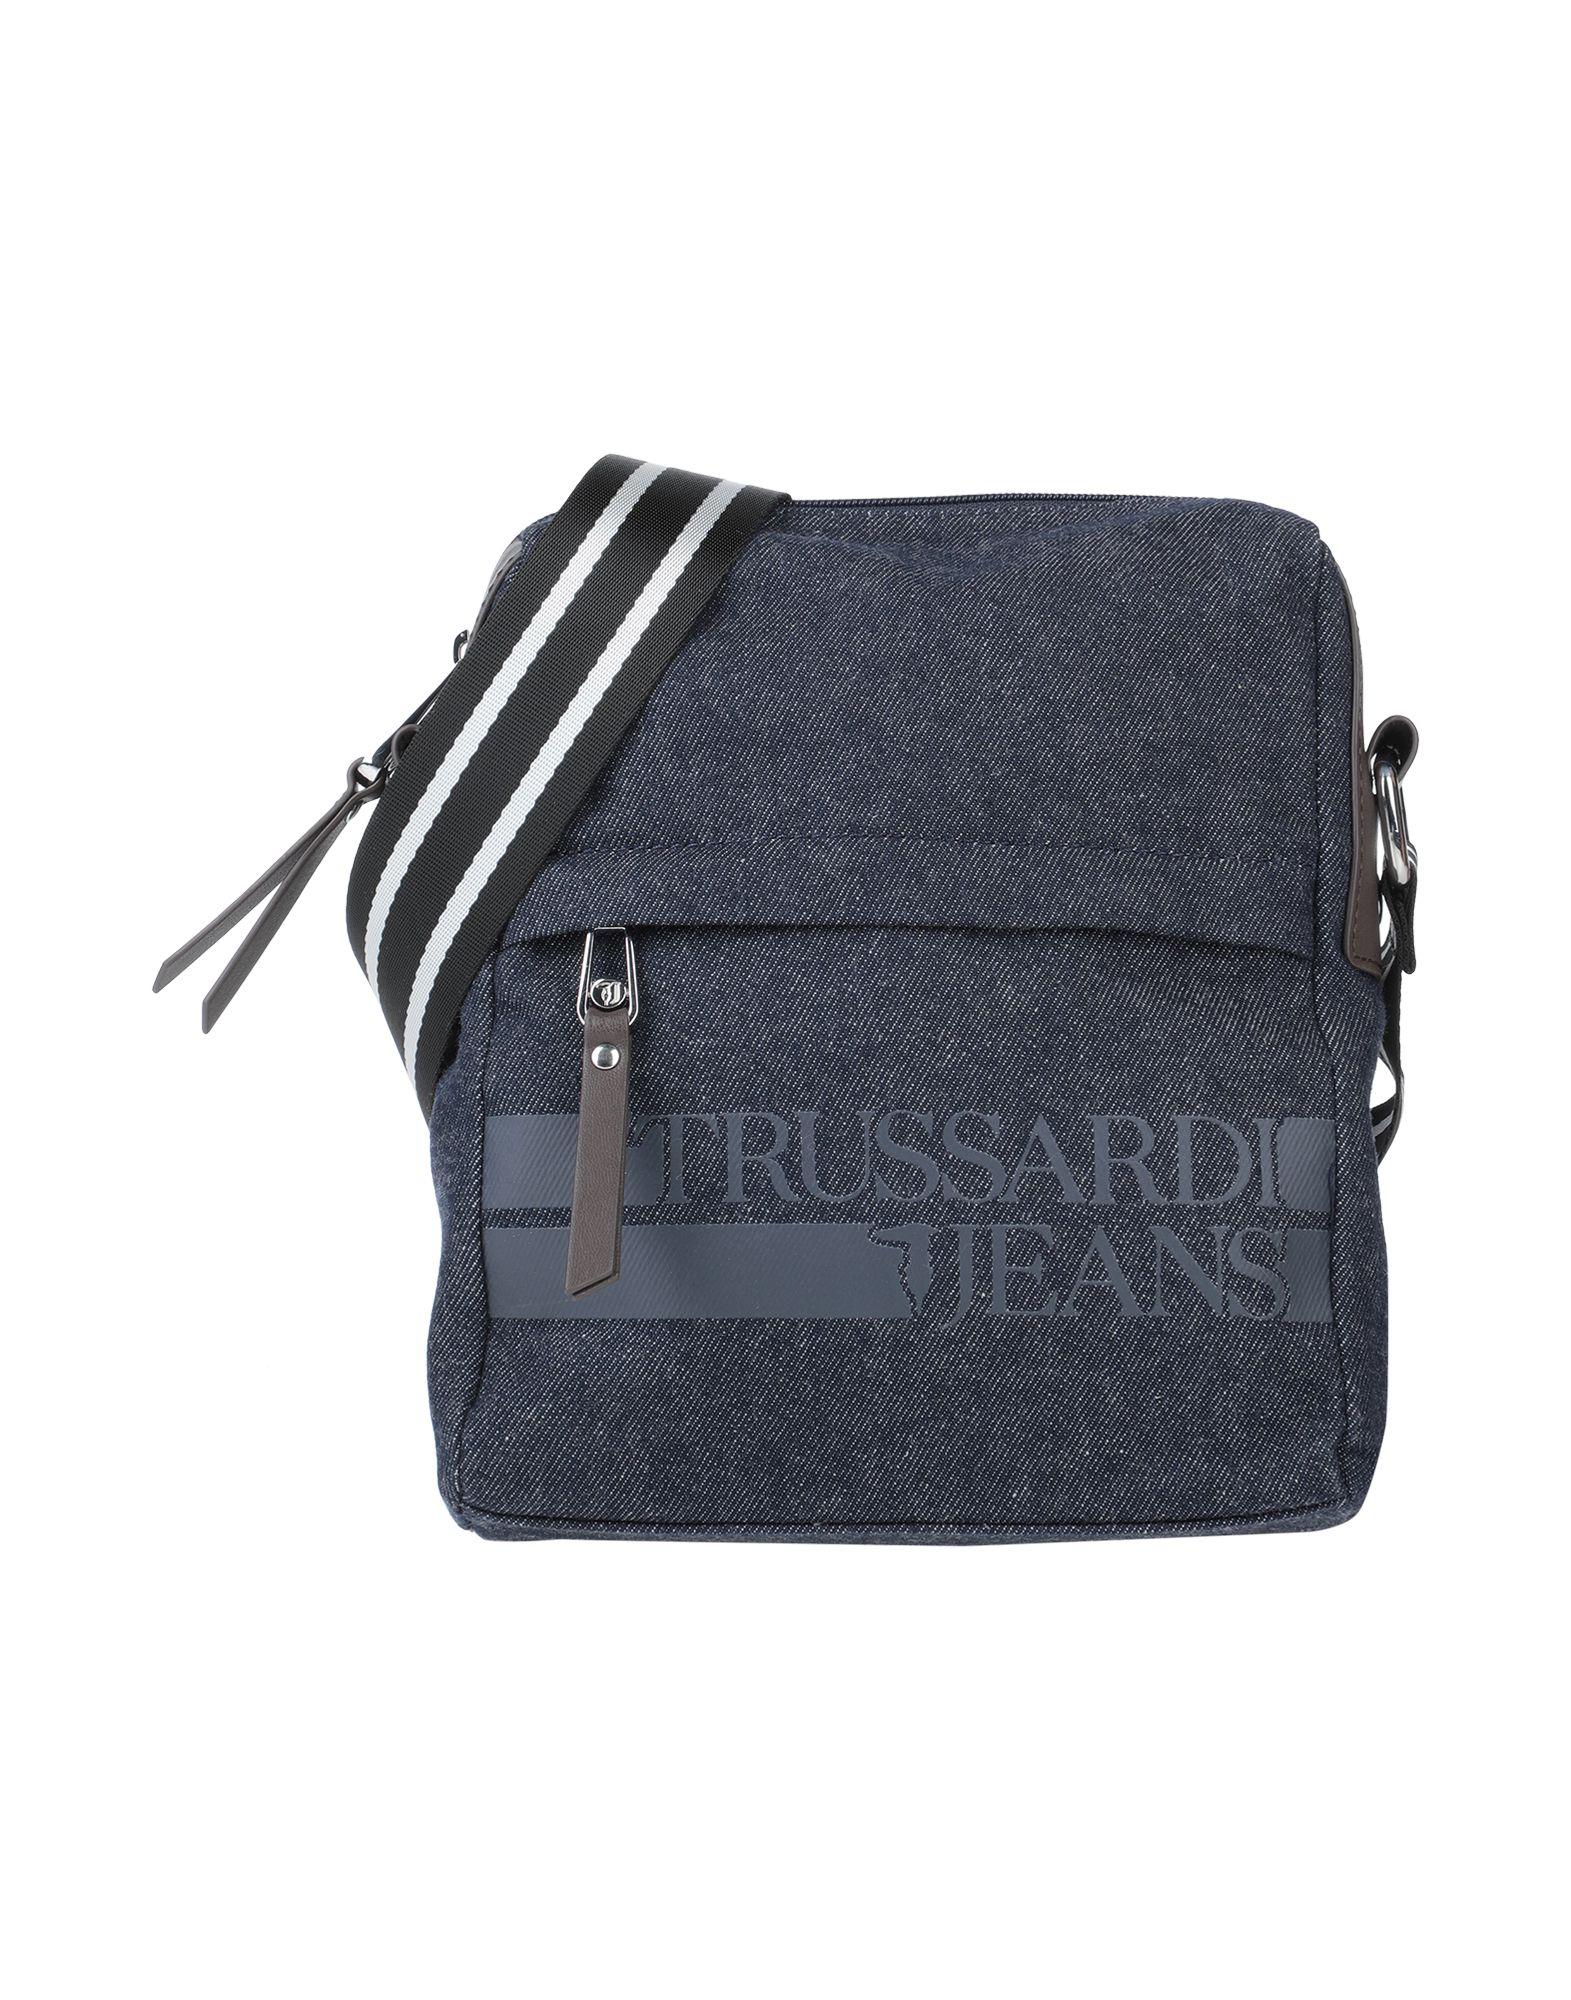 TRUSSARDI JEANS Сумка через плечо сумка trussardi jeans trussardi jeans tr016bmoos34 page 9